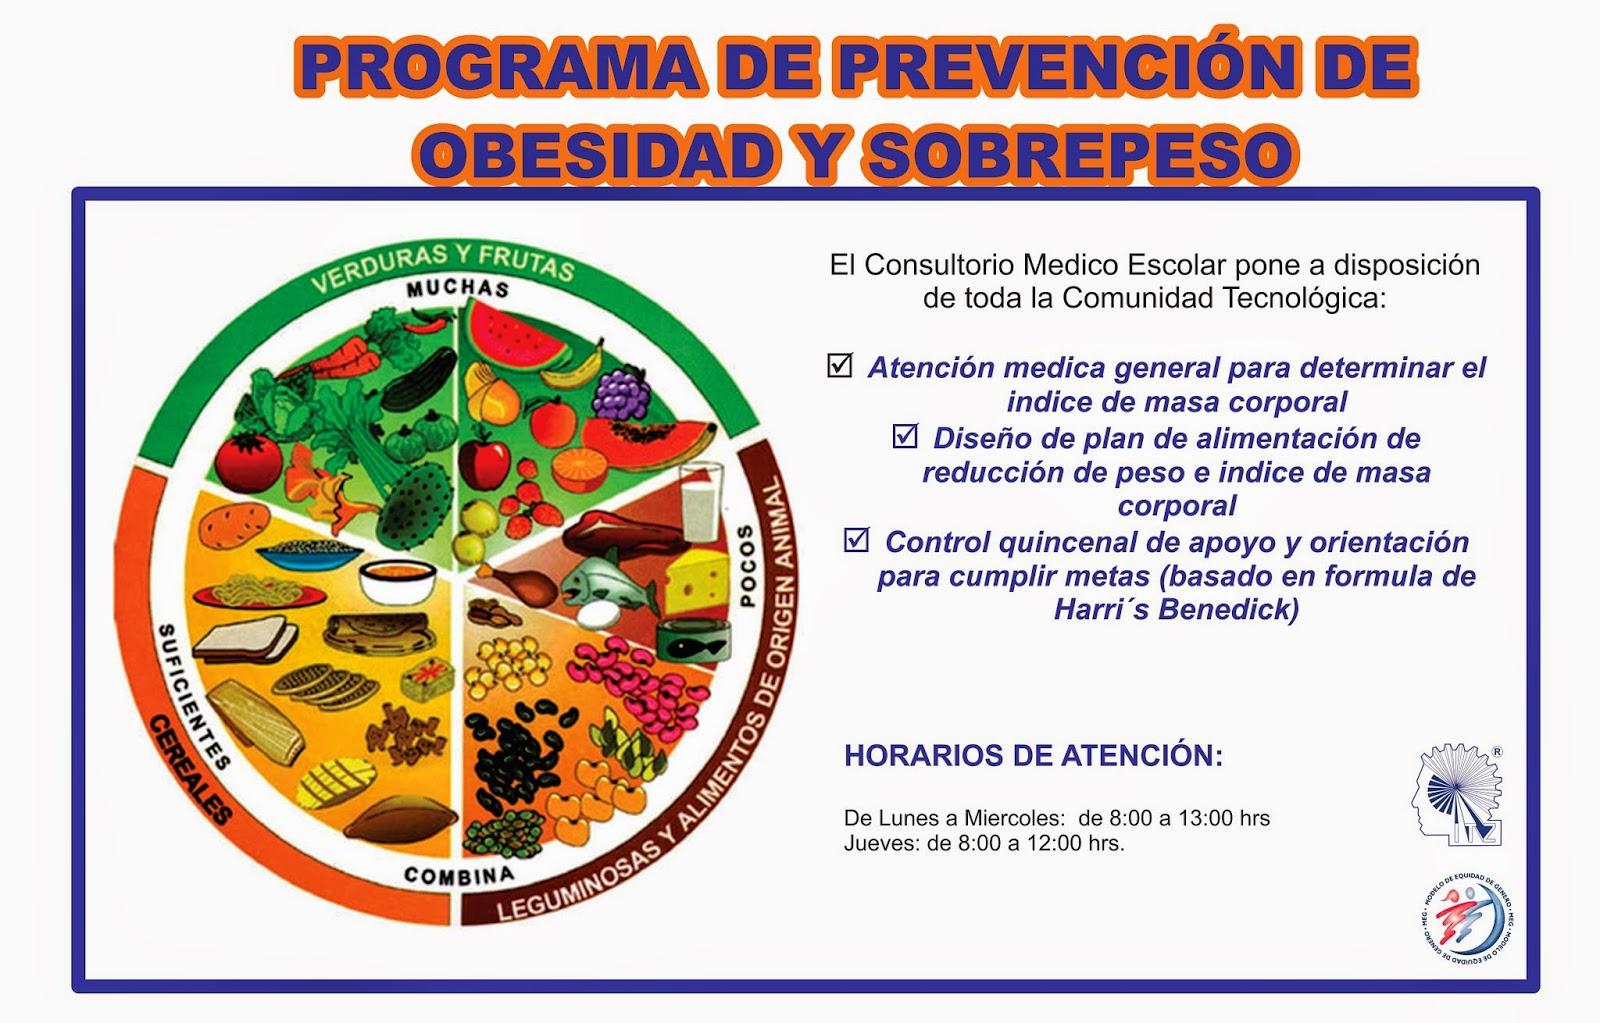 Instituto Tecnologico de Zacatepec - PROGRAMA DE